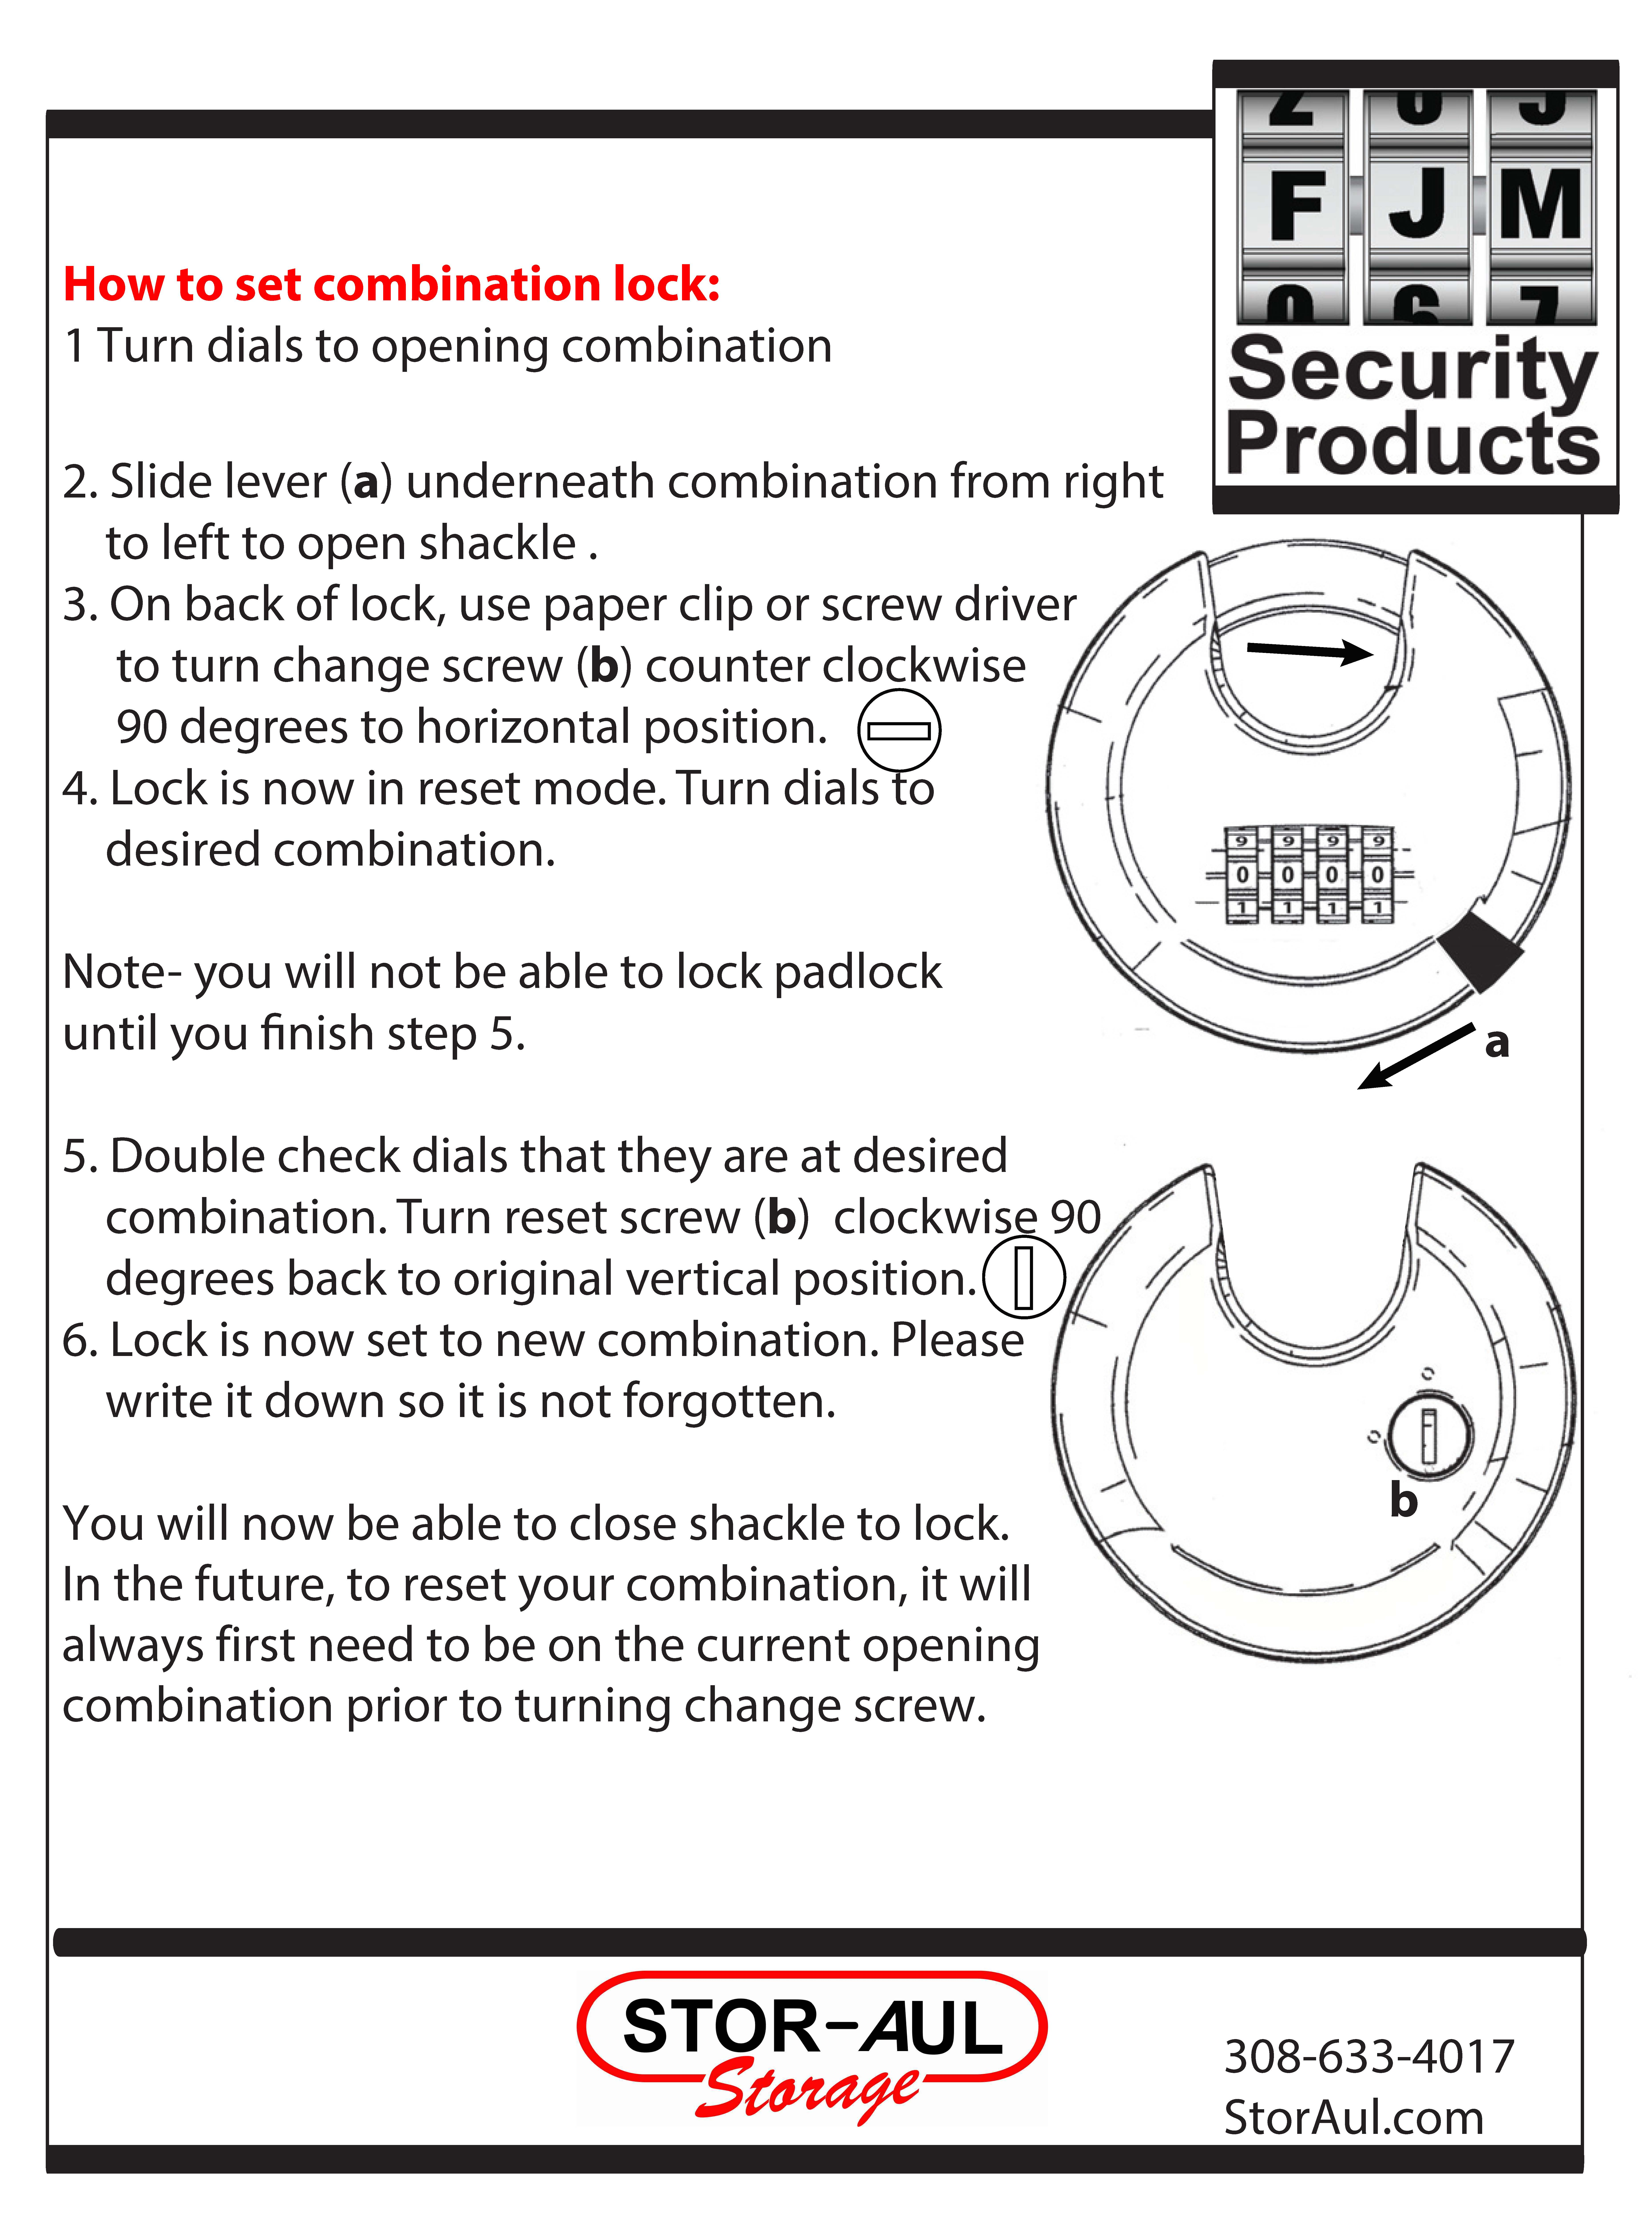 Lock directions